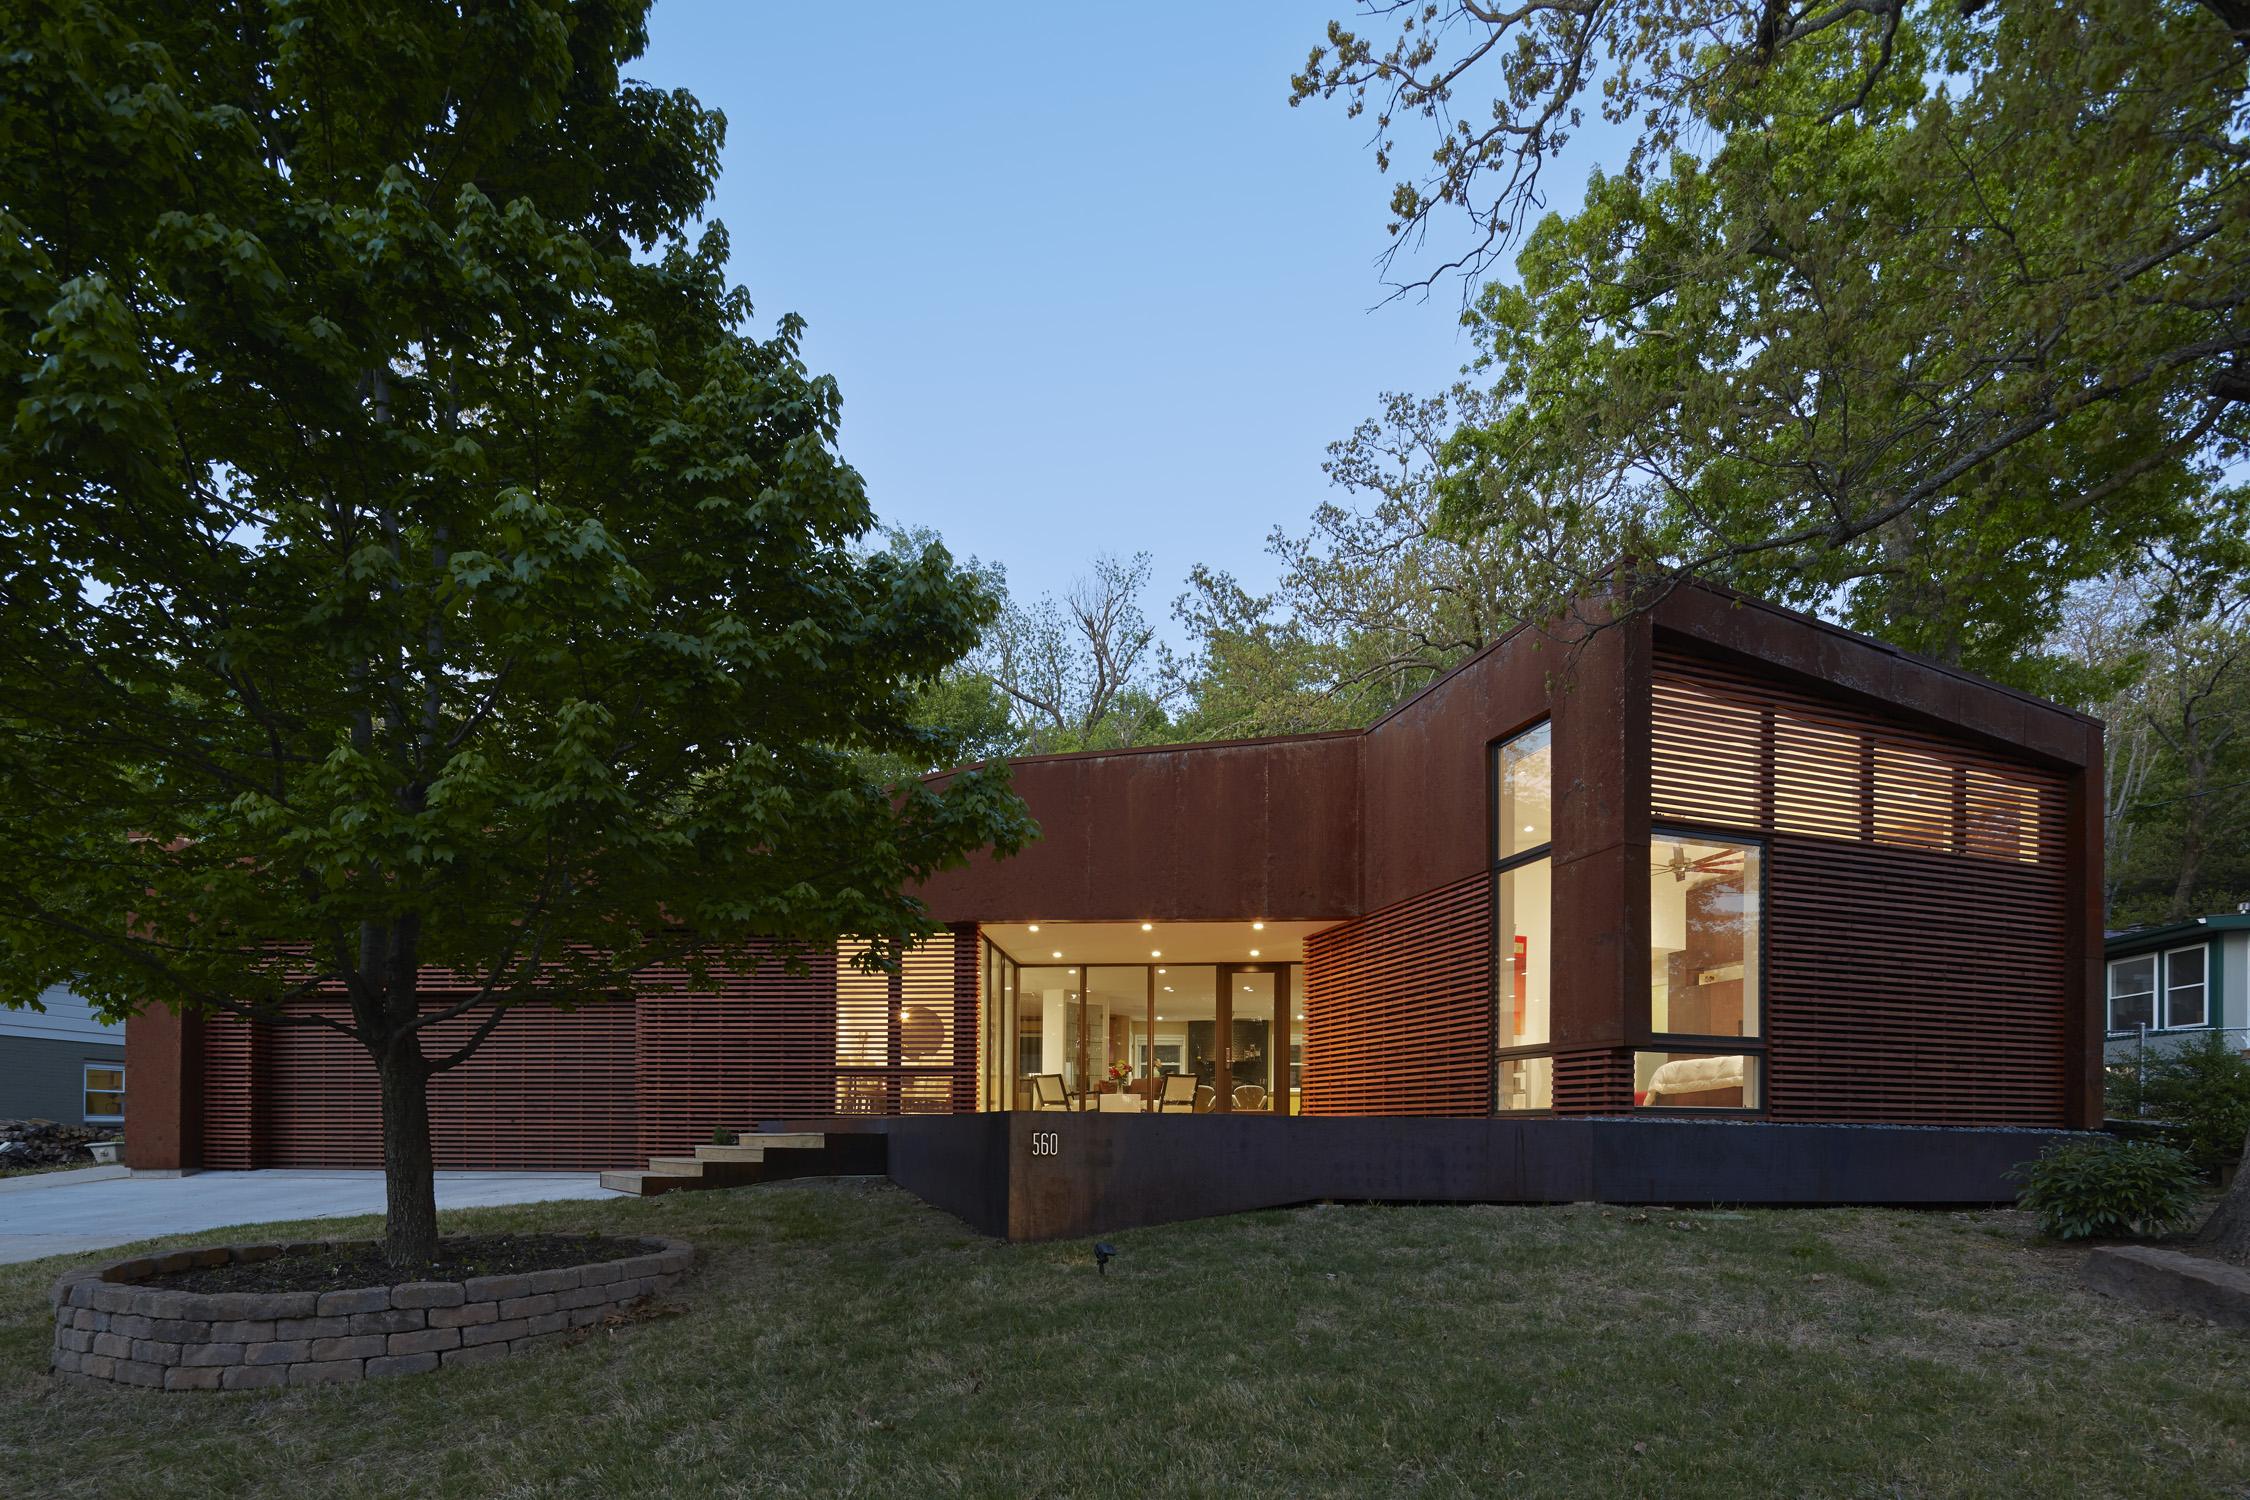 560 Vinson | Modus Studio | Fayetteville, AR (Photographer: Timothy Hursley)